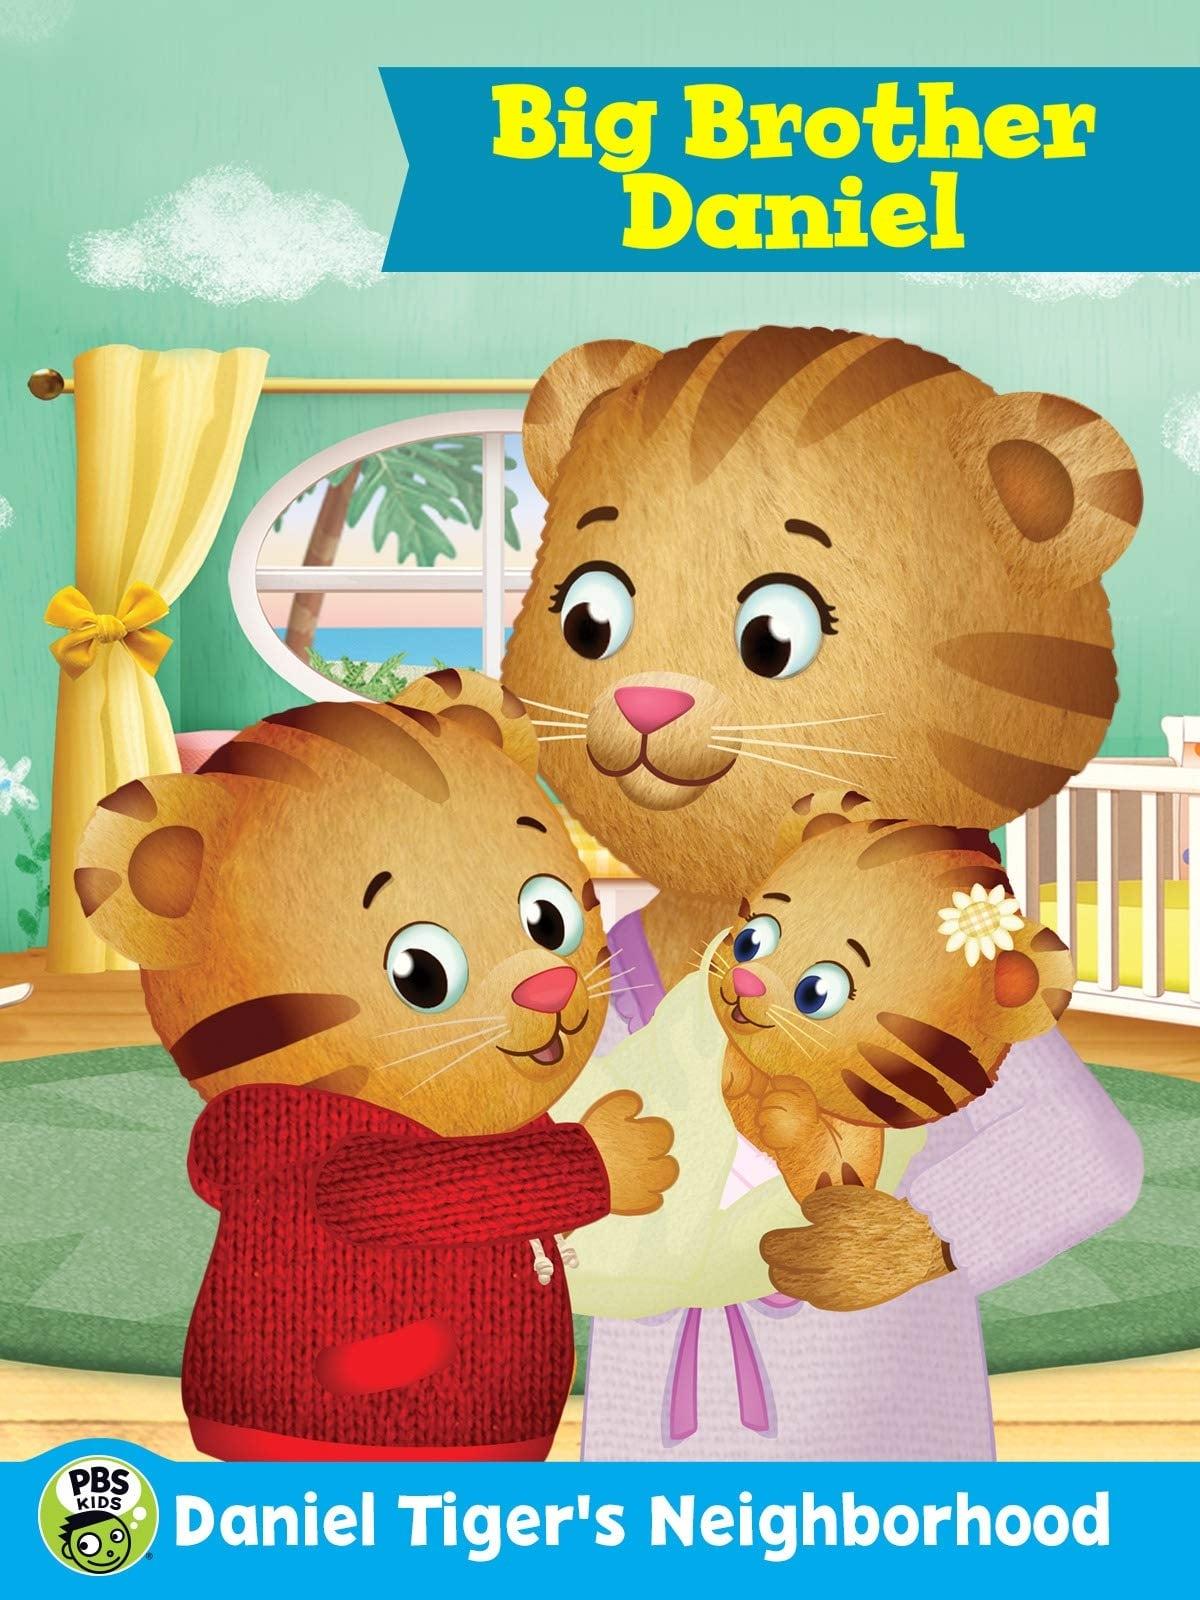 Daniel Tiger's Neighborhood: Big Brother Daniel (2017)